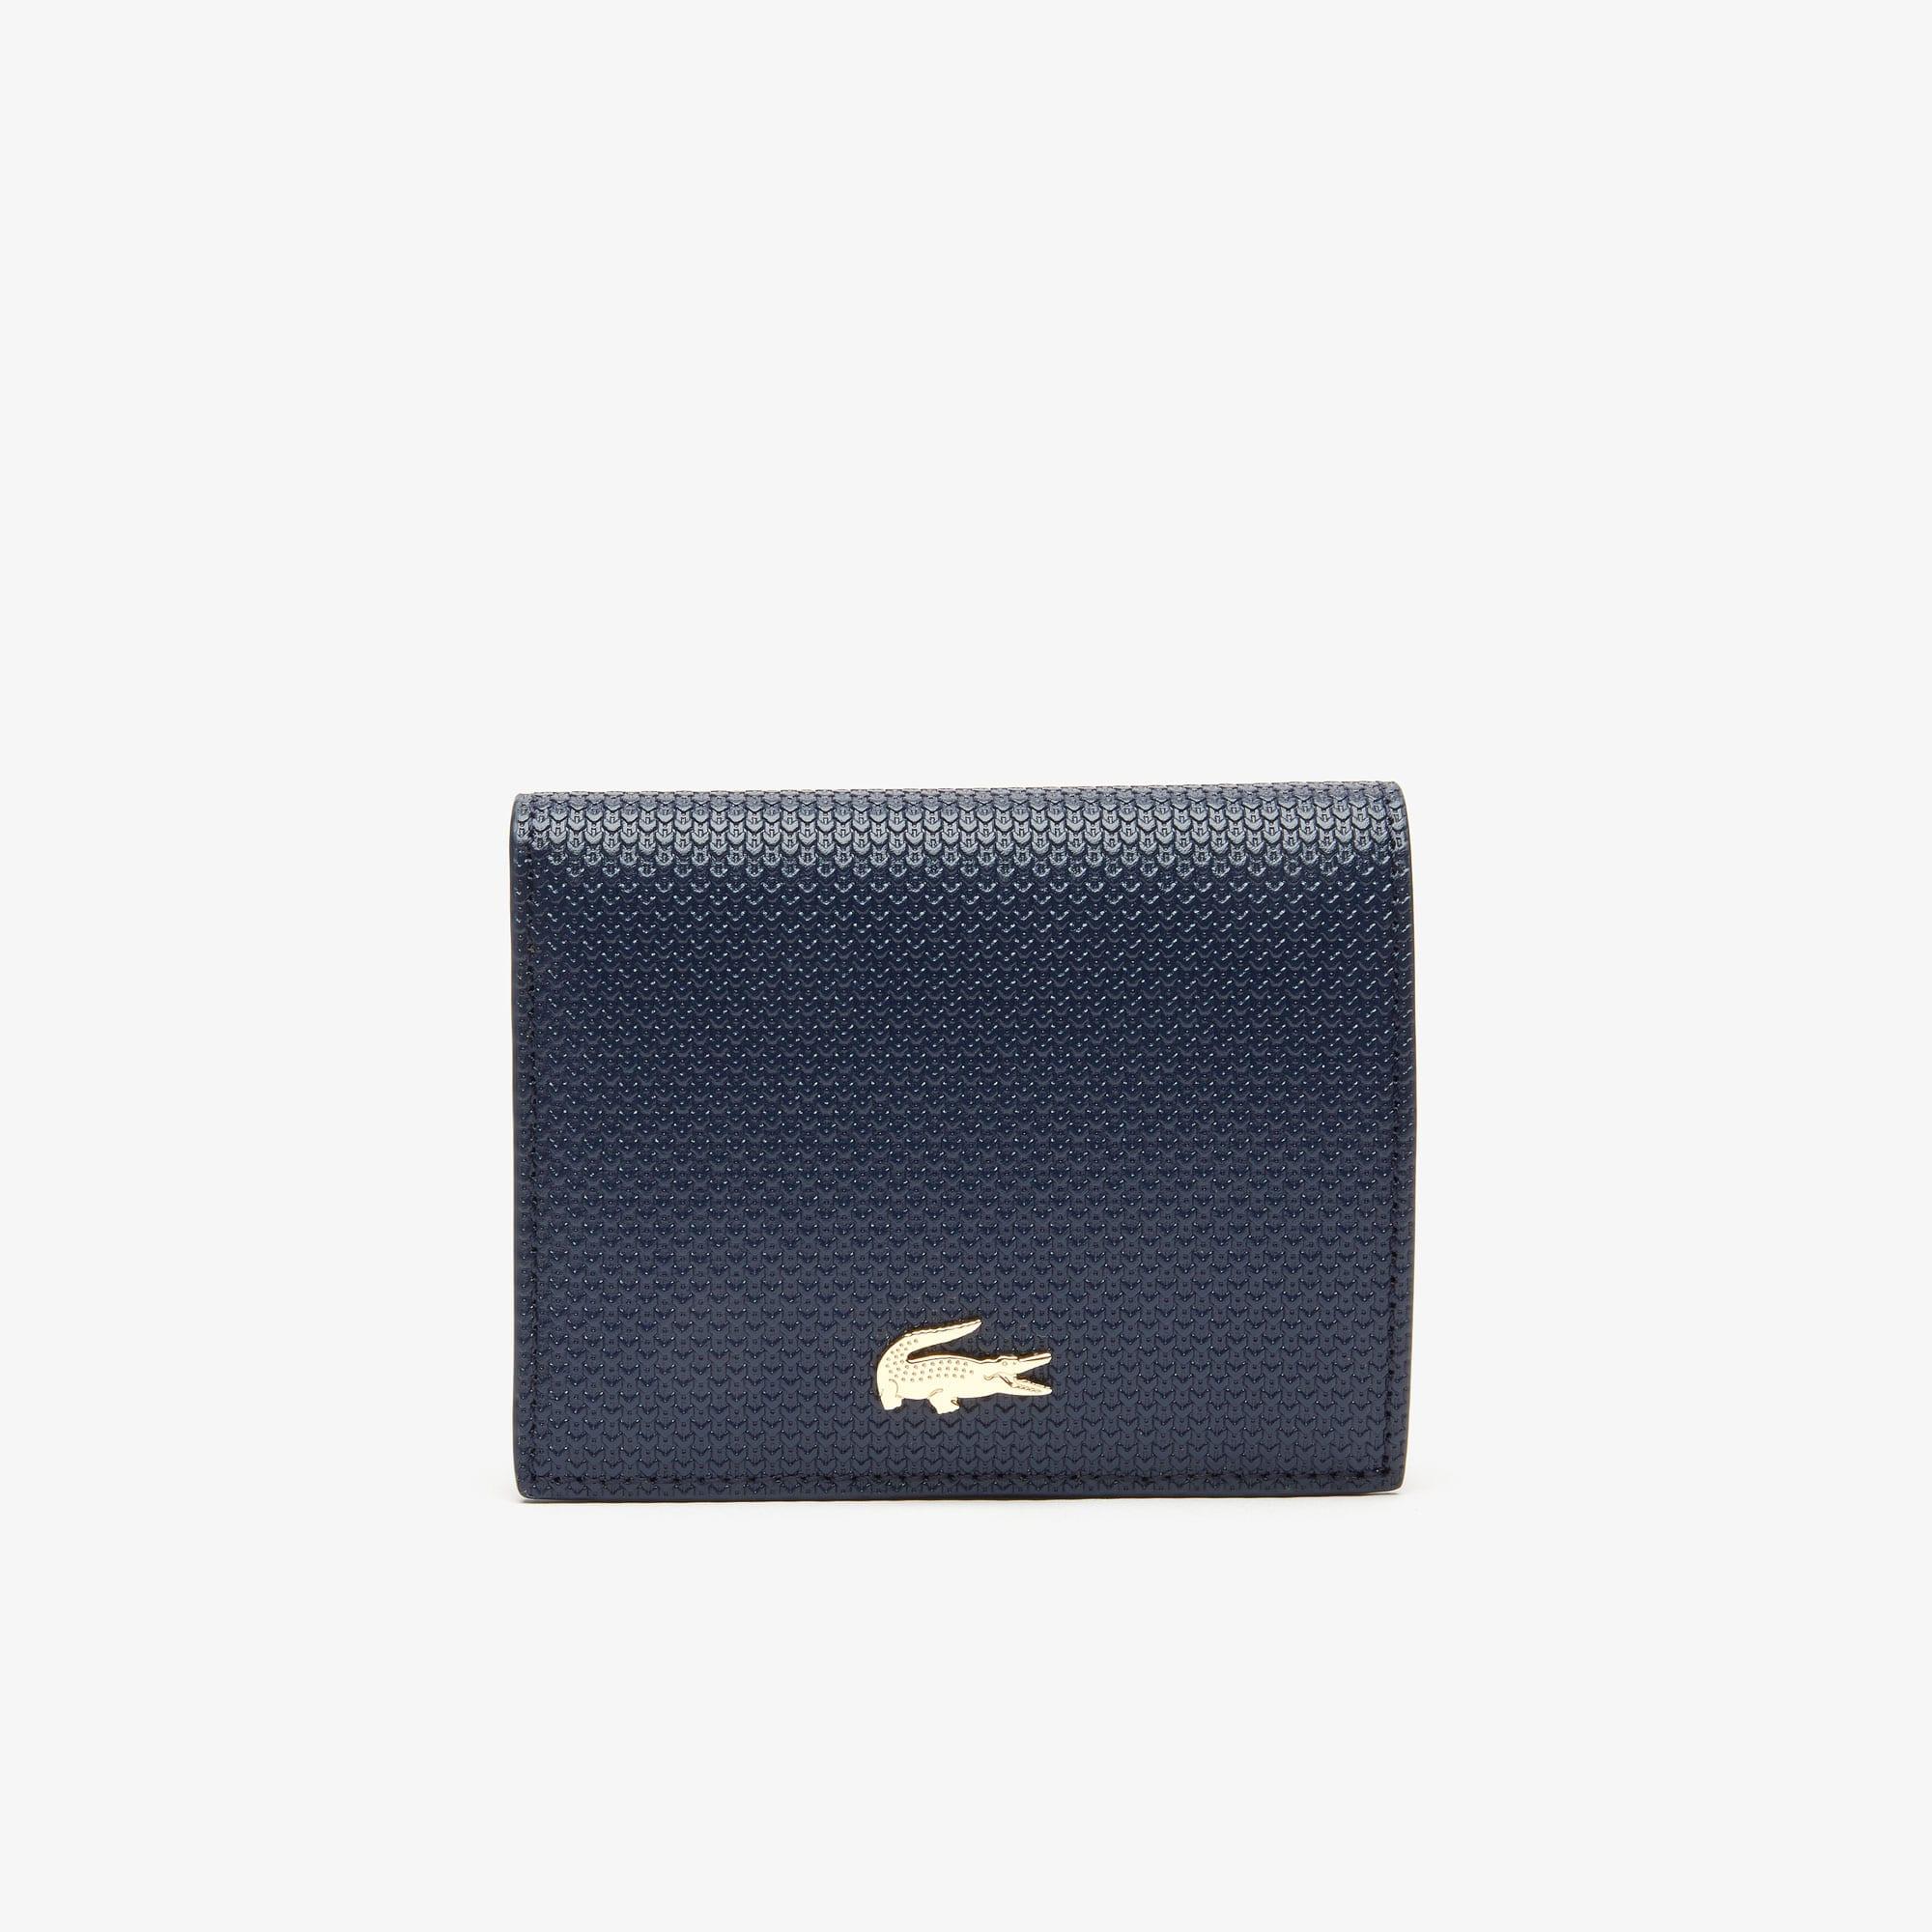 8949da02f7 Lacoste Motion Leather Goods | LACOSTE